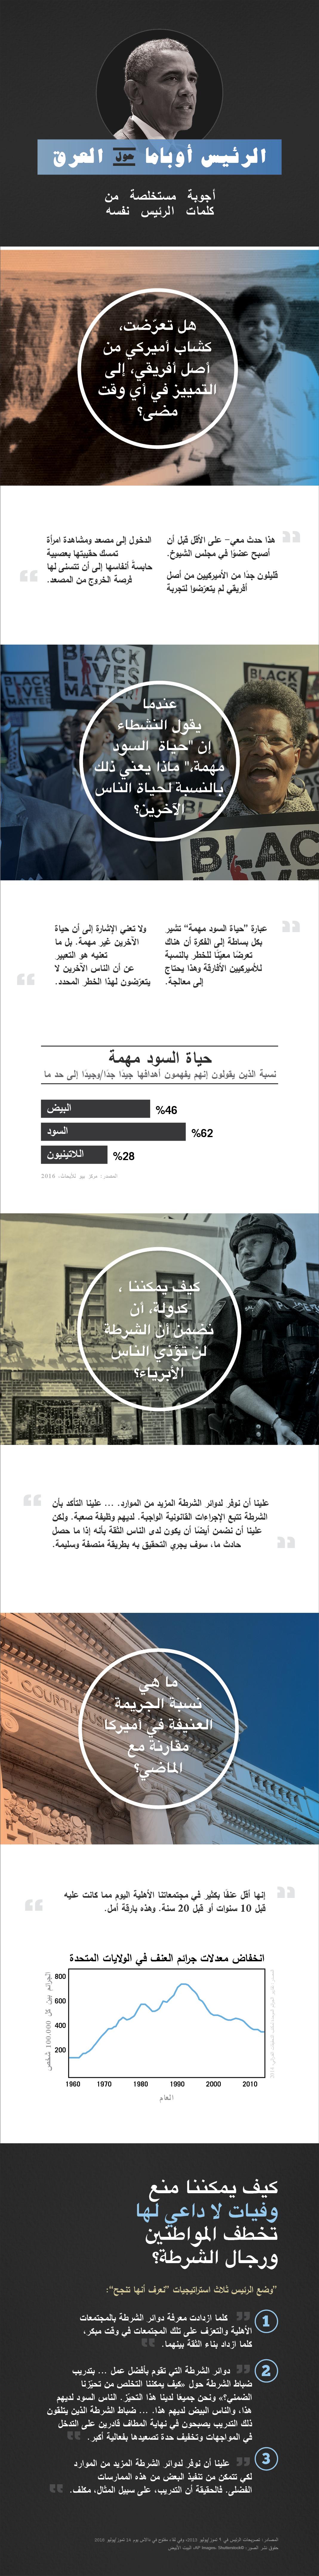 ObamaOnRace_Arabic